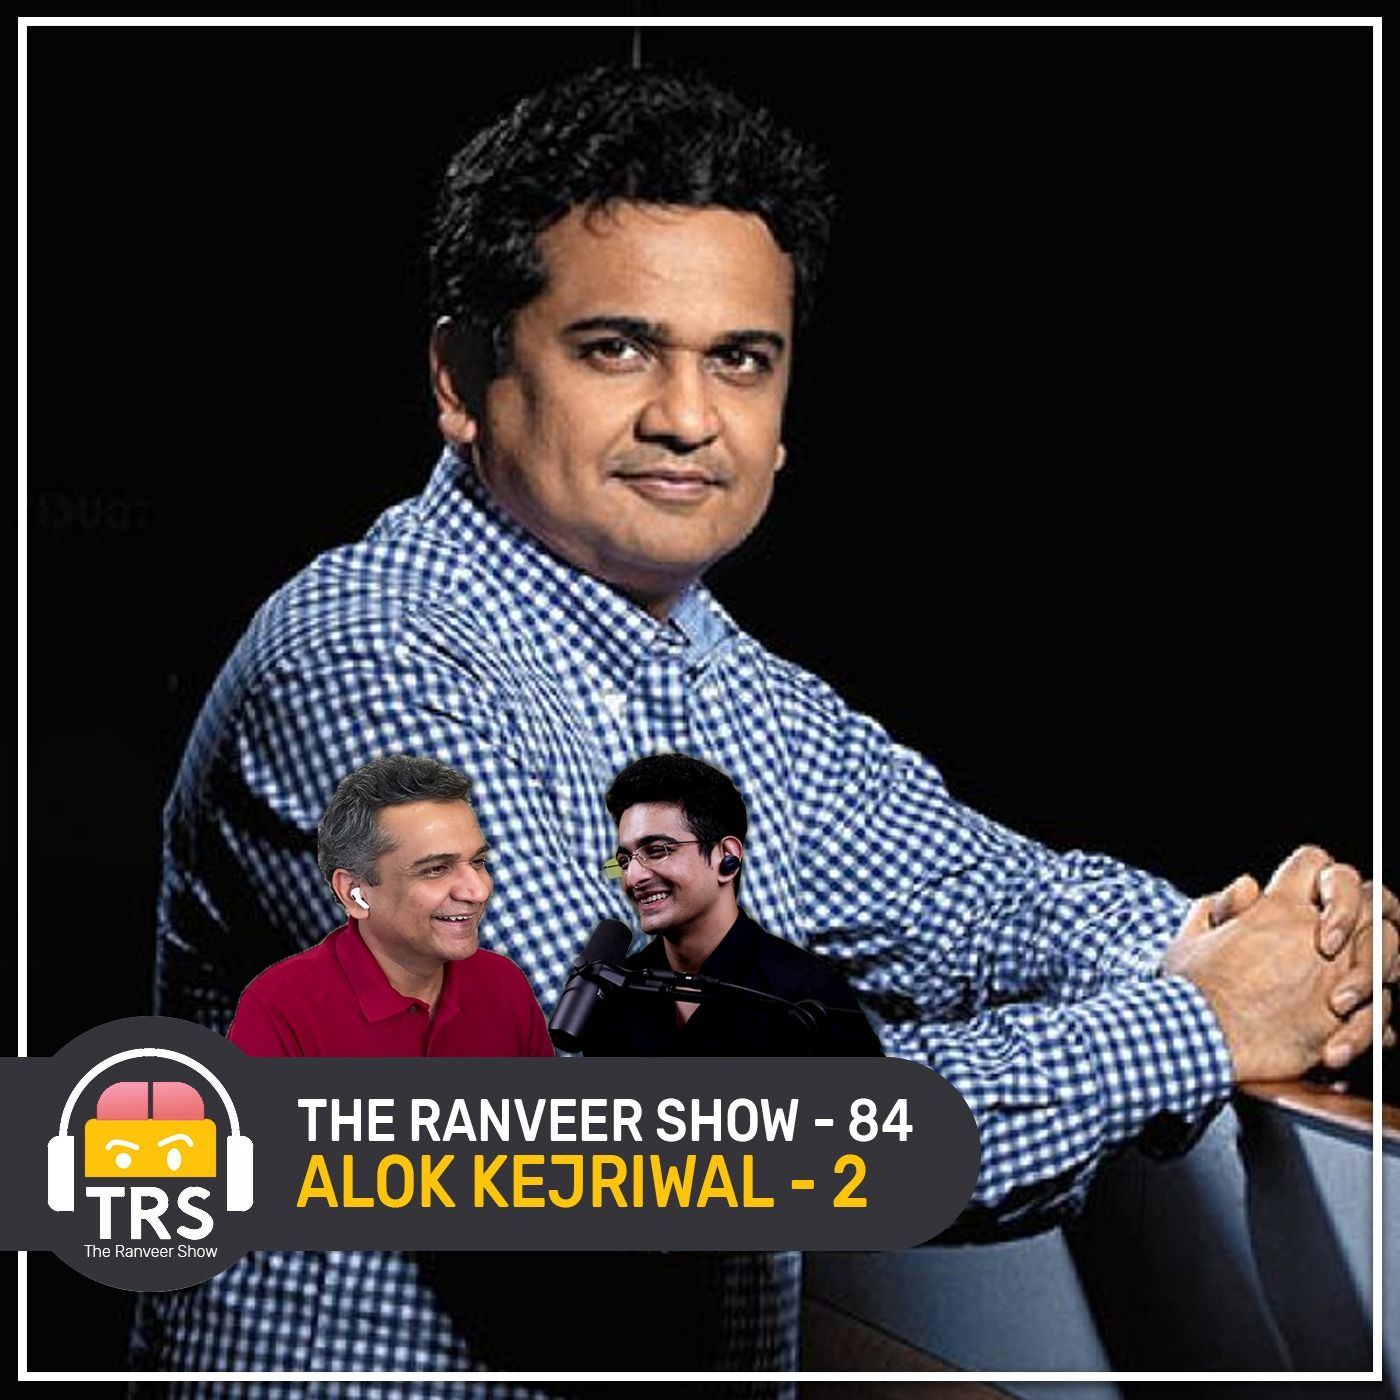 """How Meditation Built My Billionaire Career"" - Alok Kejriwal's Spiritual Story | The Ranveer Show 84"